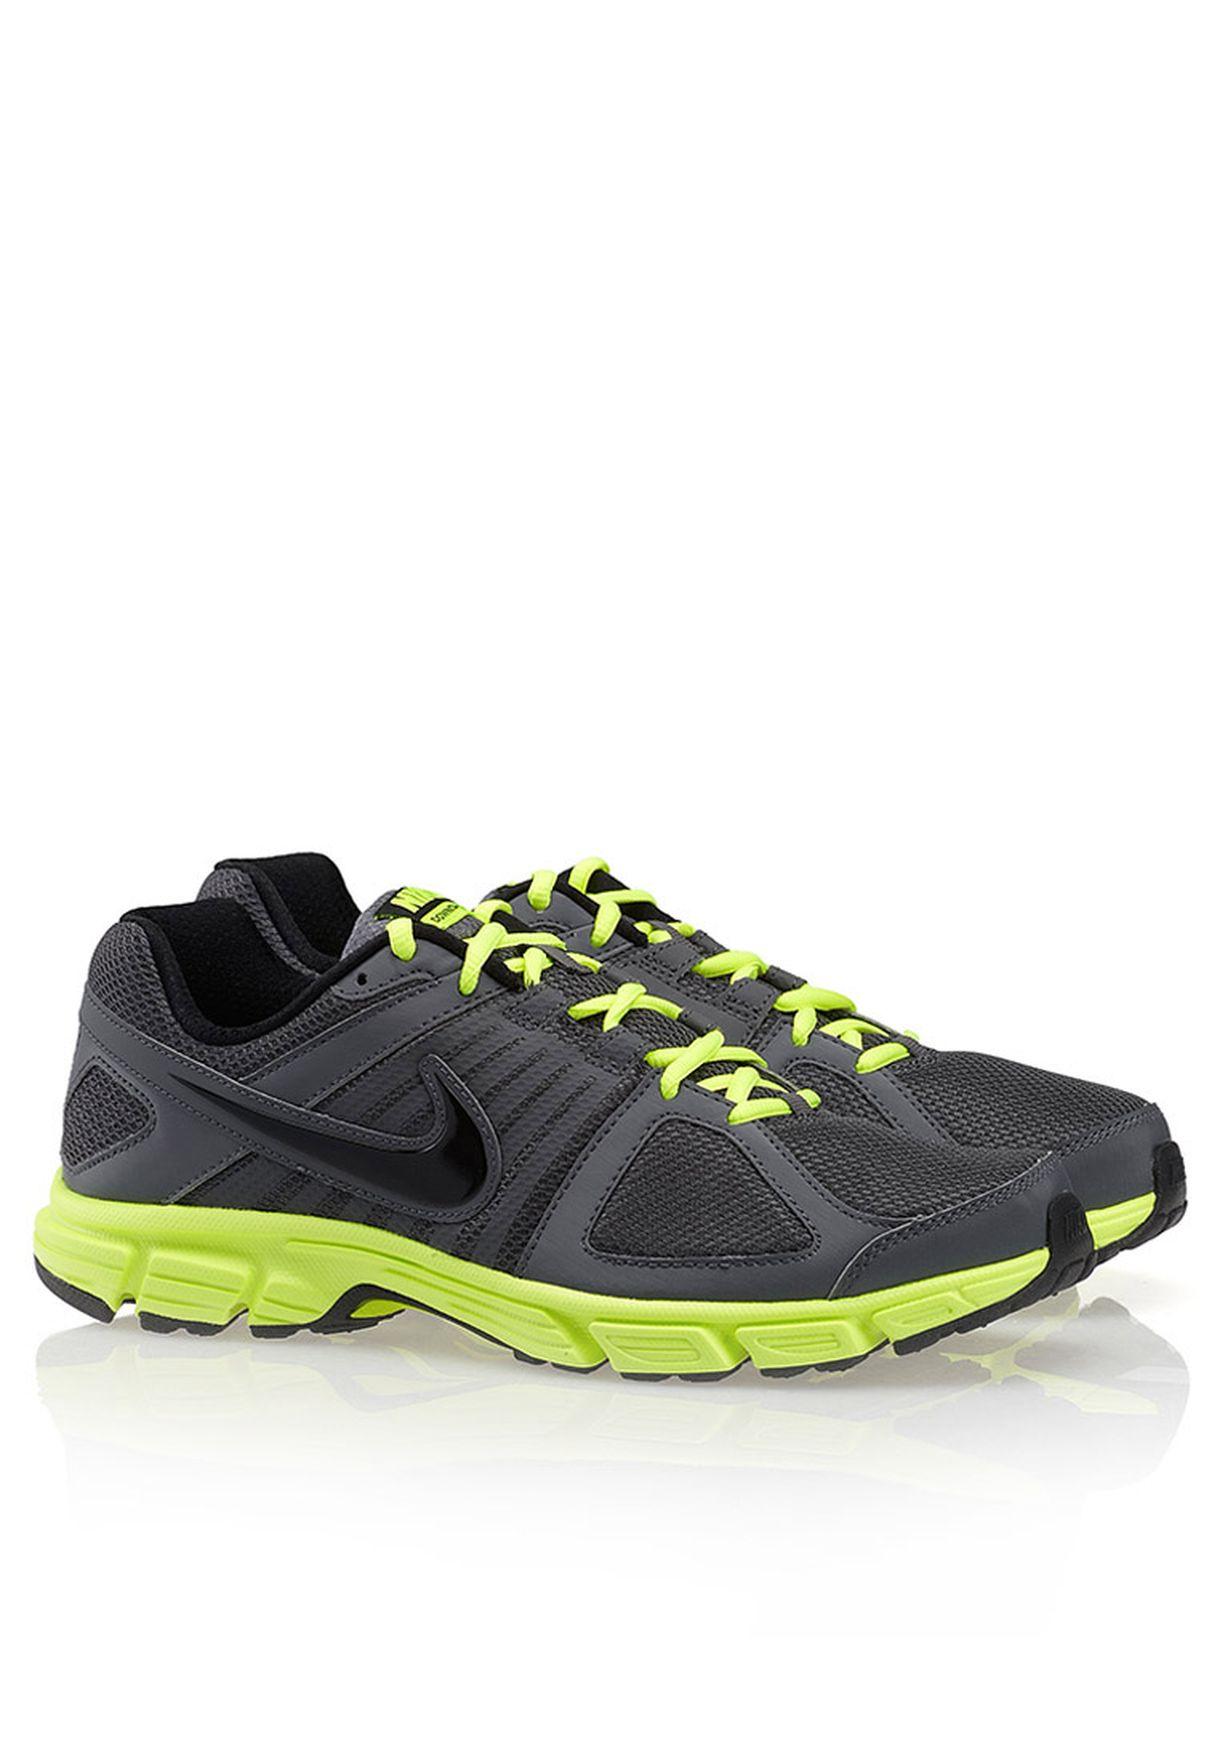 606d8a469c8 Shop Nike grey NIKE Downshifter 5 MSL 538258-024 for Men in Kuwait -  NI727SH08NZZ